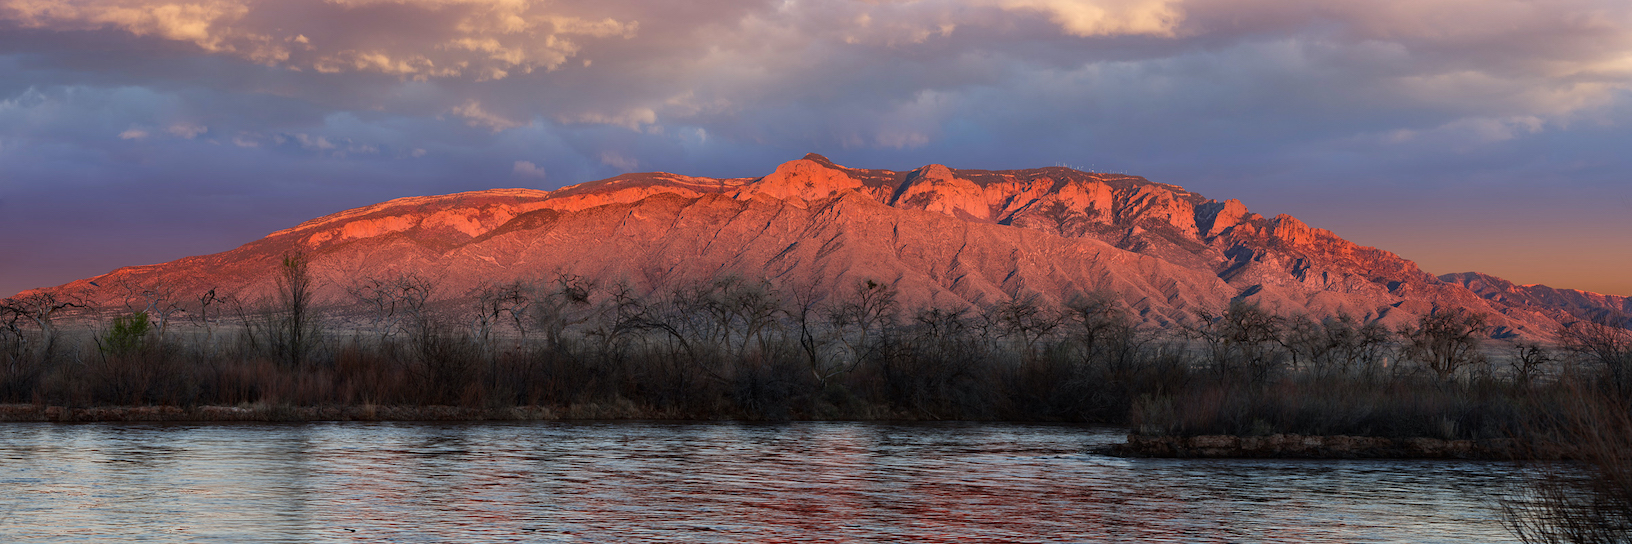 Dennis Chamberlain: Sandias and the Rio Grande